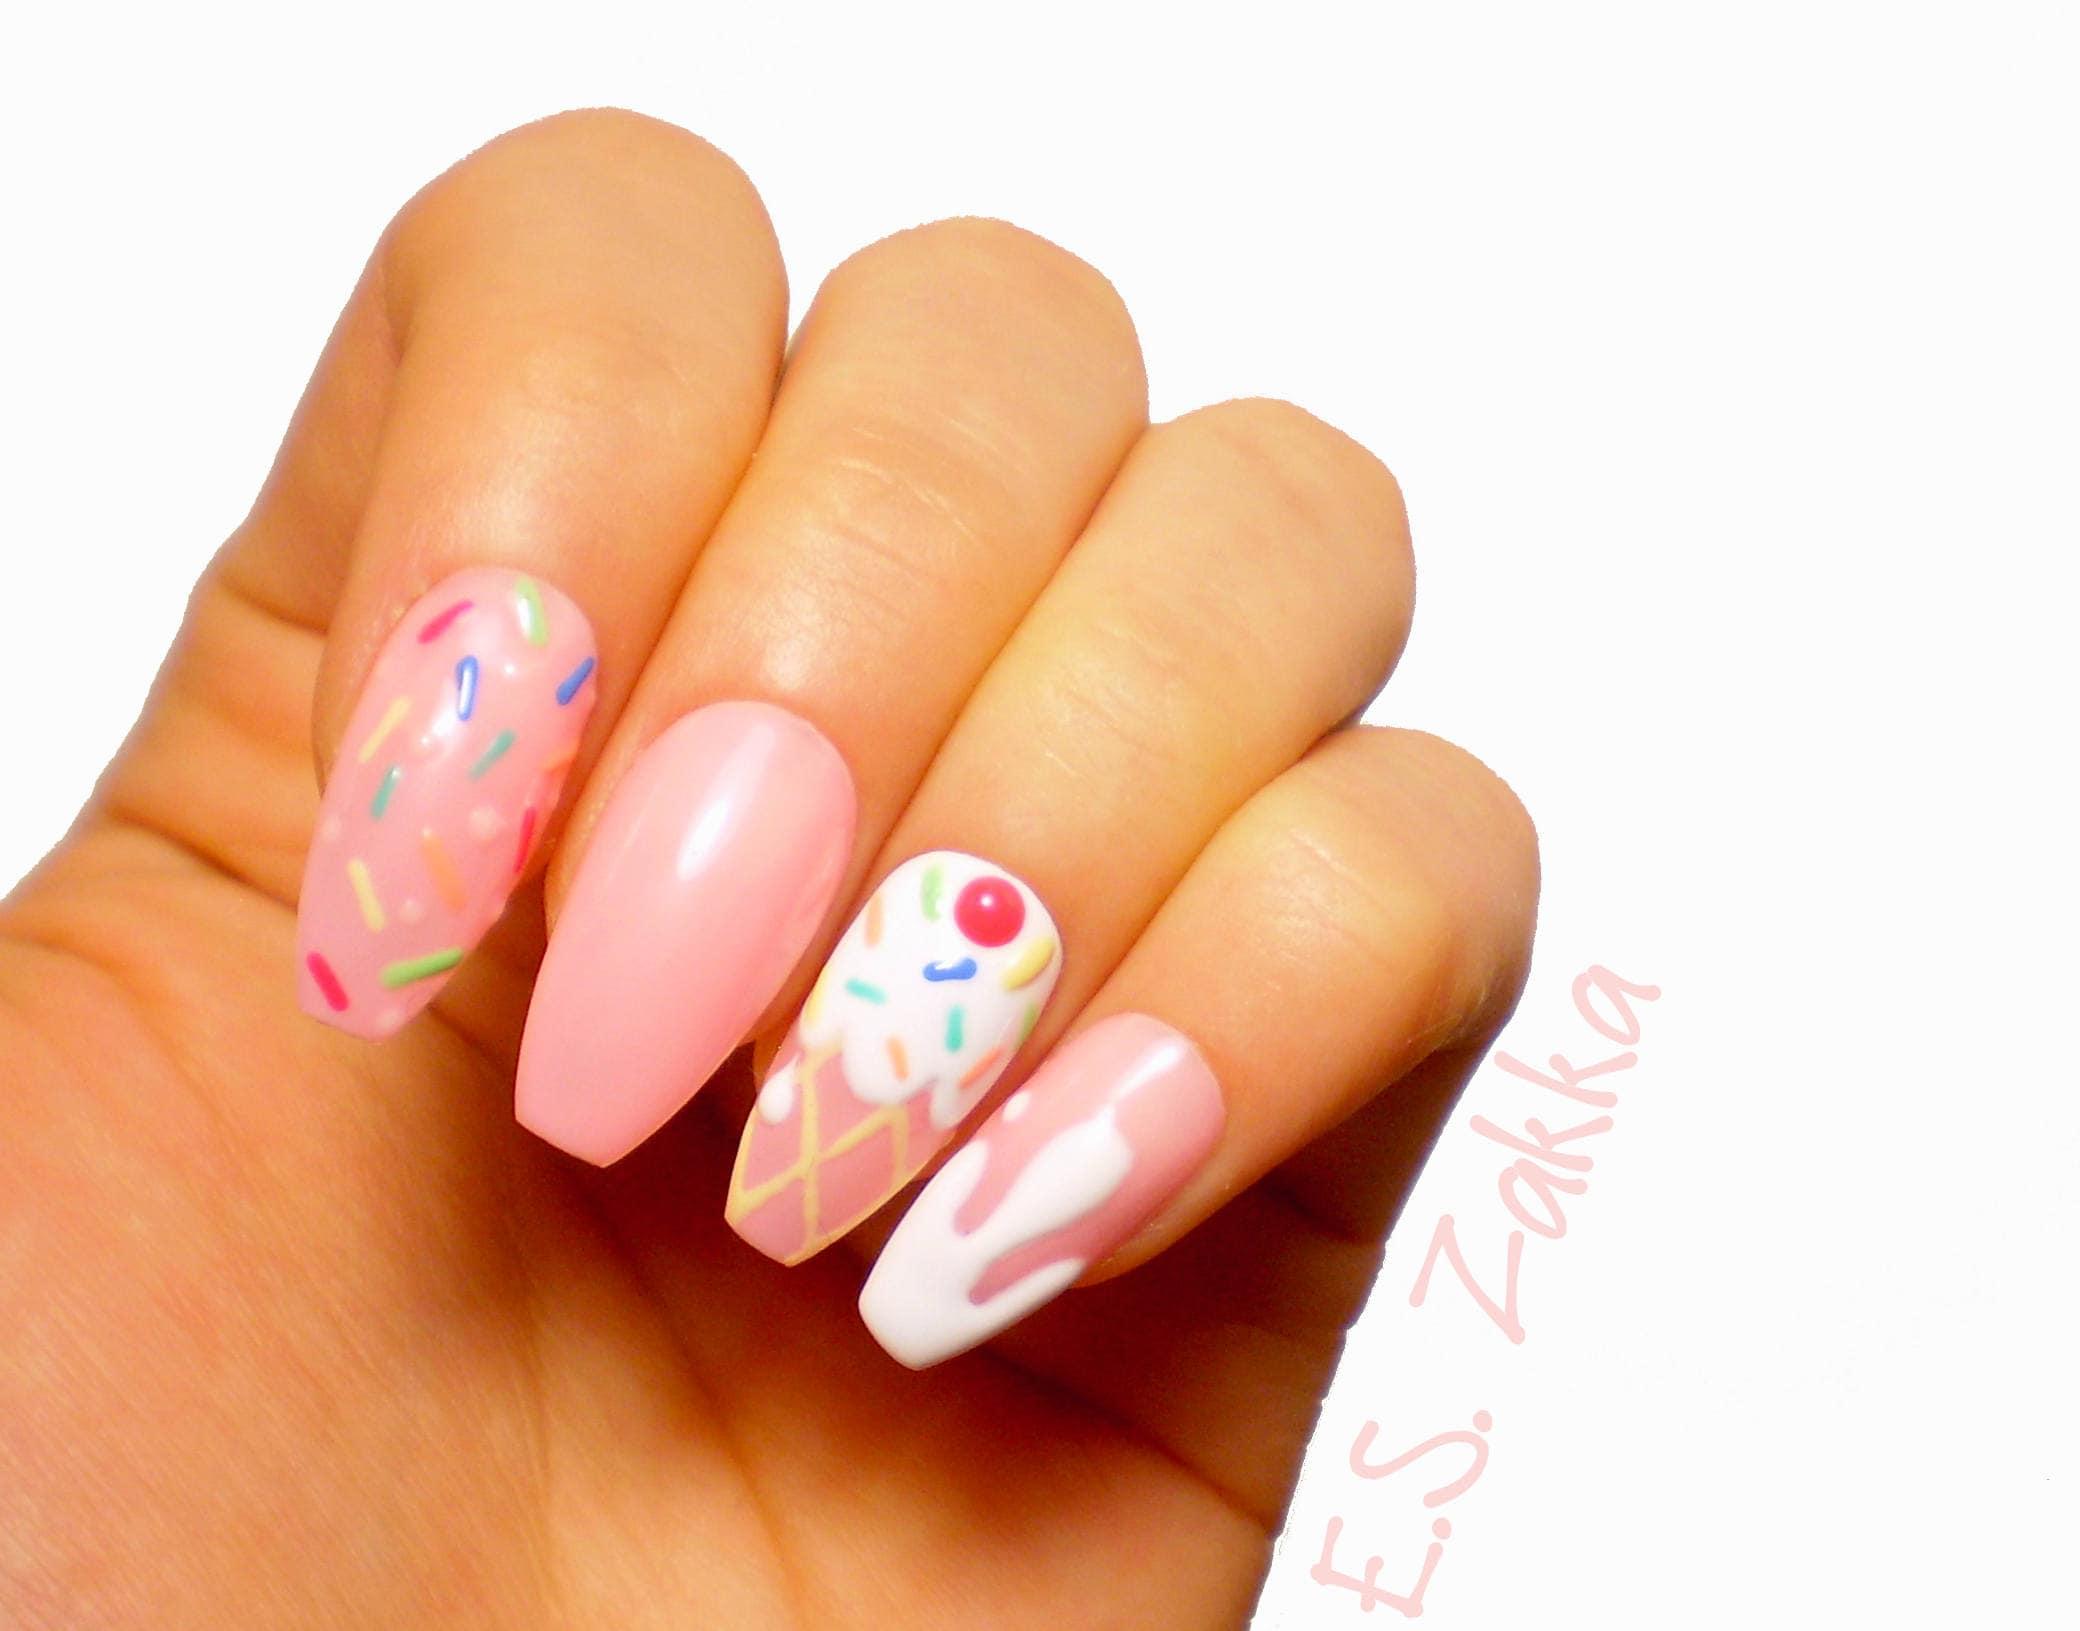 Ice Cream Gel Nails / Fake nails, glue on nails, press on nails ...